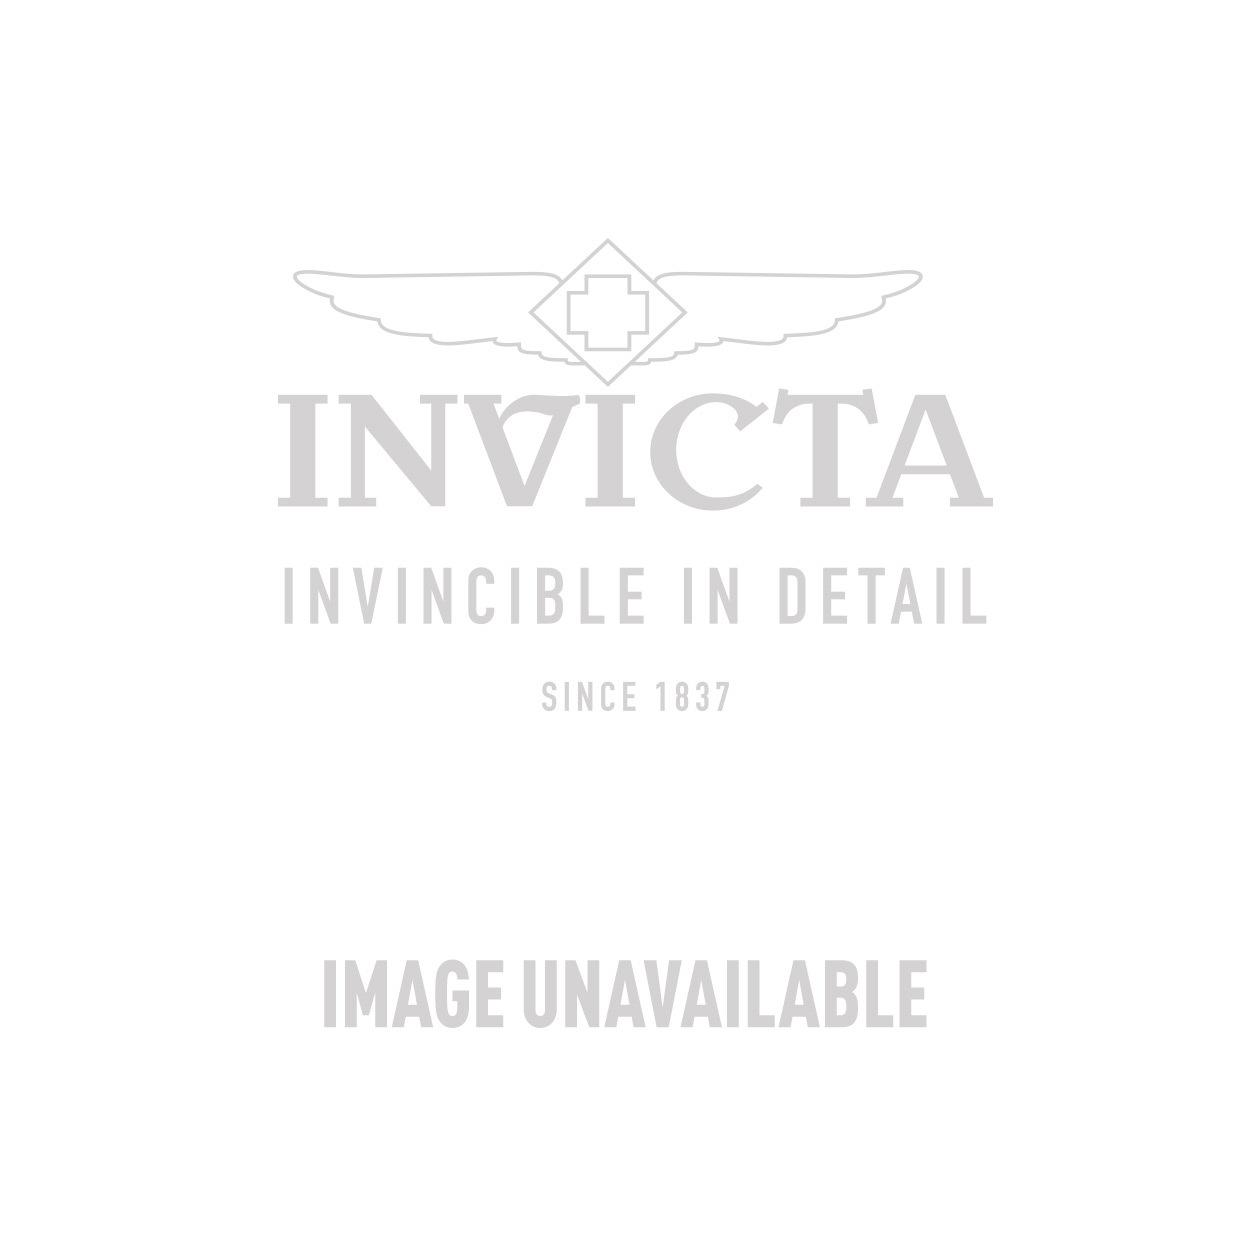 Invicta Pro Diver Quartz Watch - Gold, Stainless Steel case with Steel, Gold tone Stainless Steel band - Model 14351